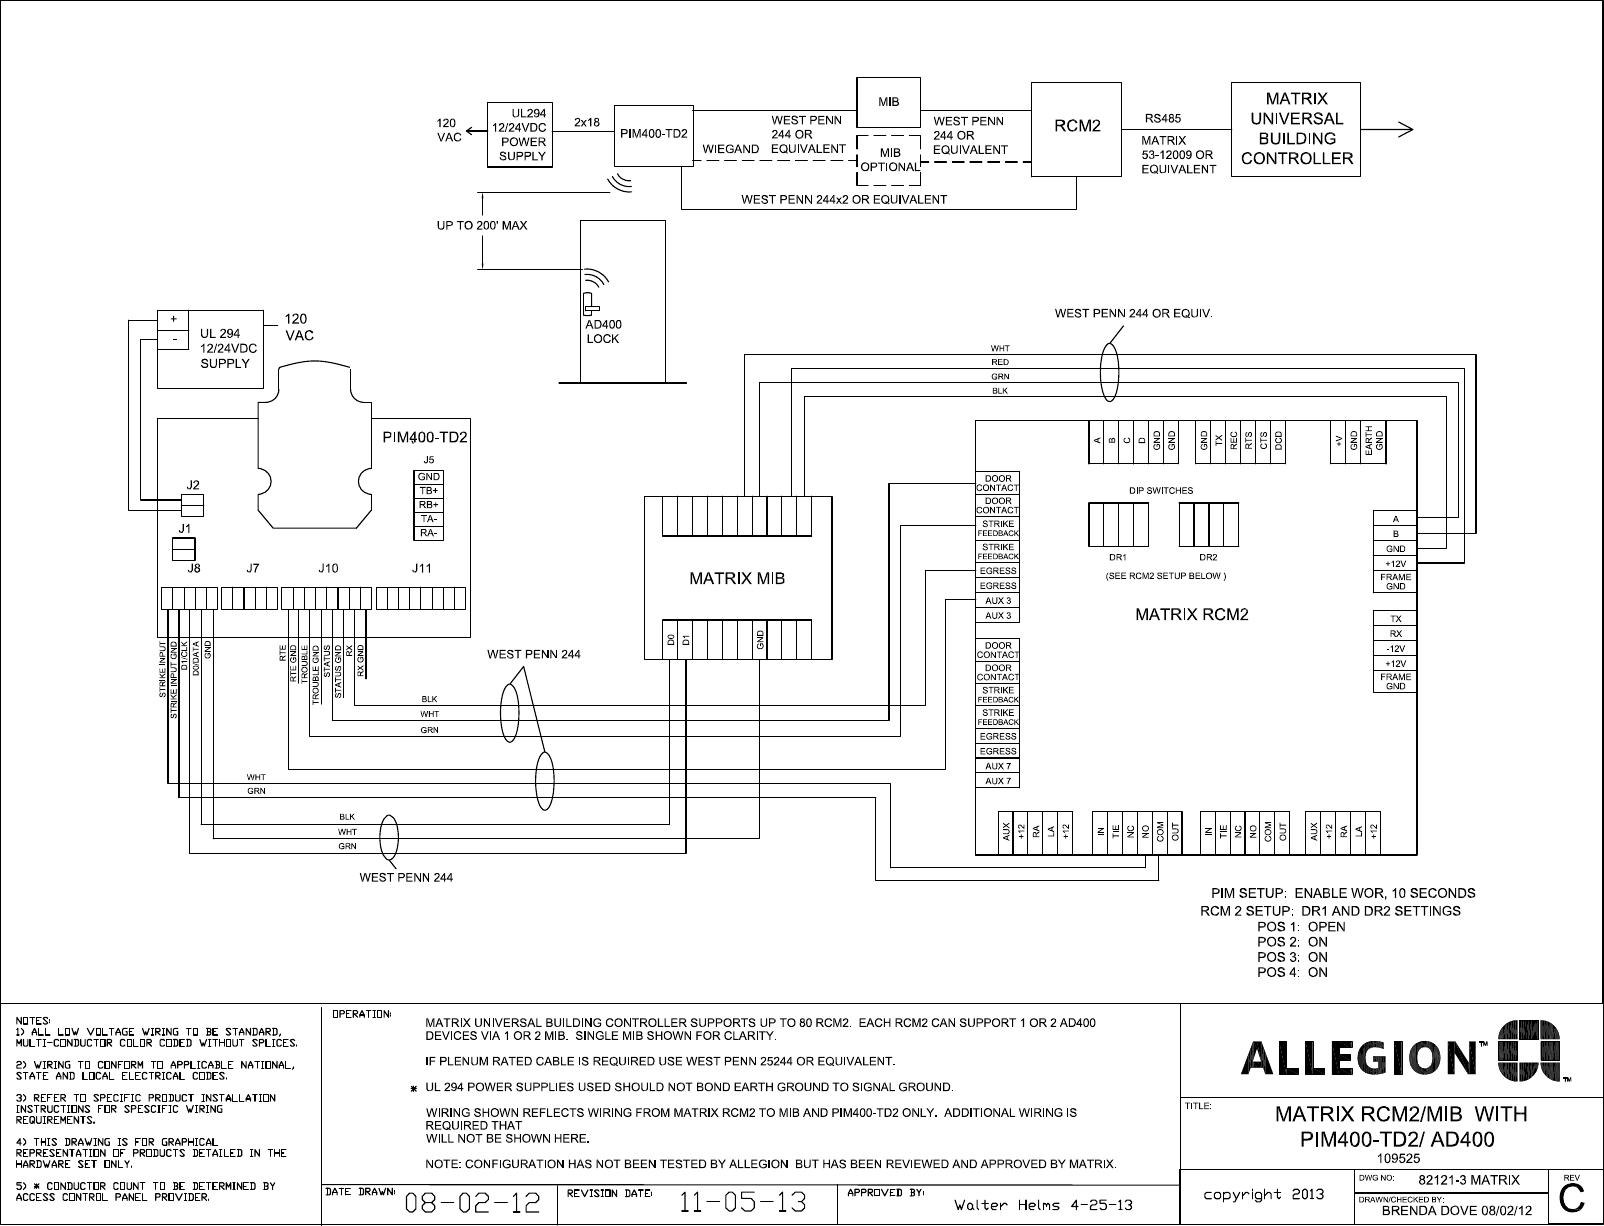 Schlage Electronics C Ad400 Matrix Ubc Rcm2 Wiegand Wiring Diagram